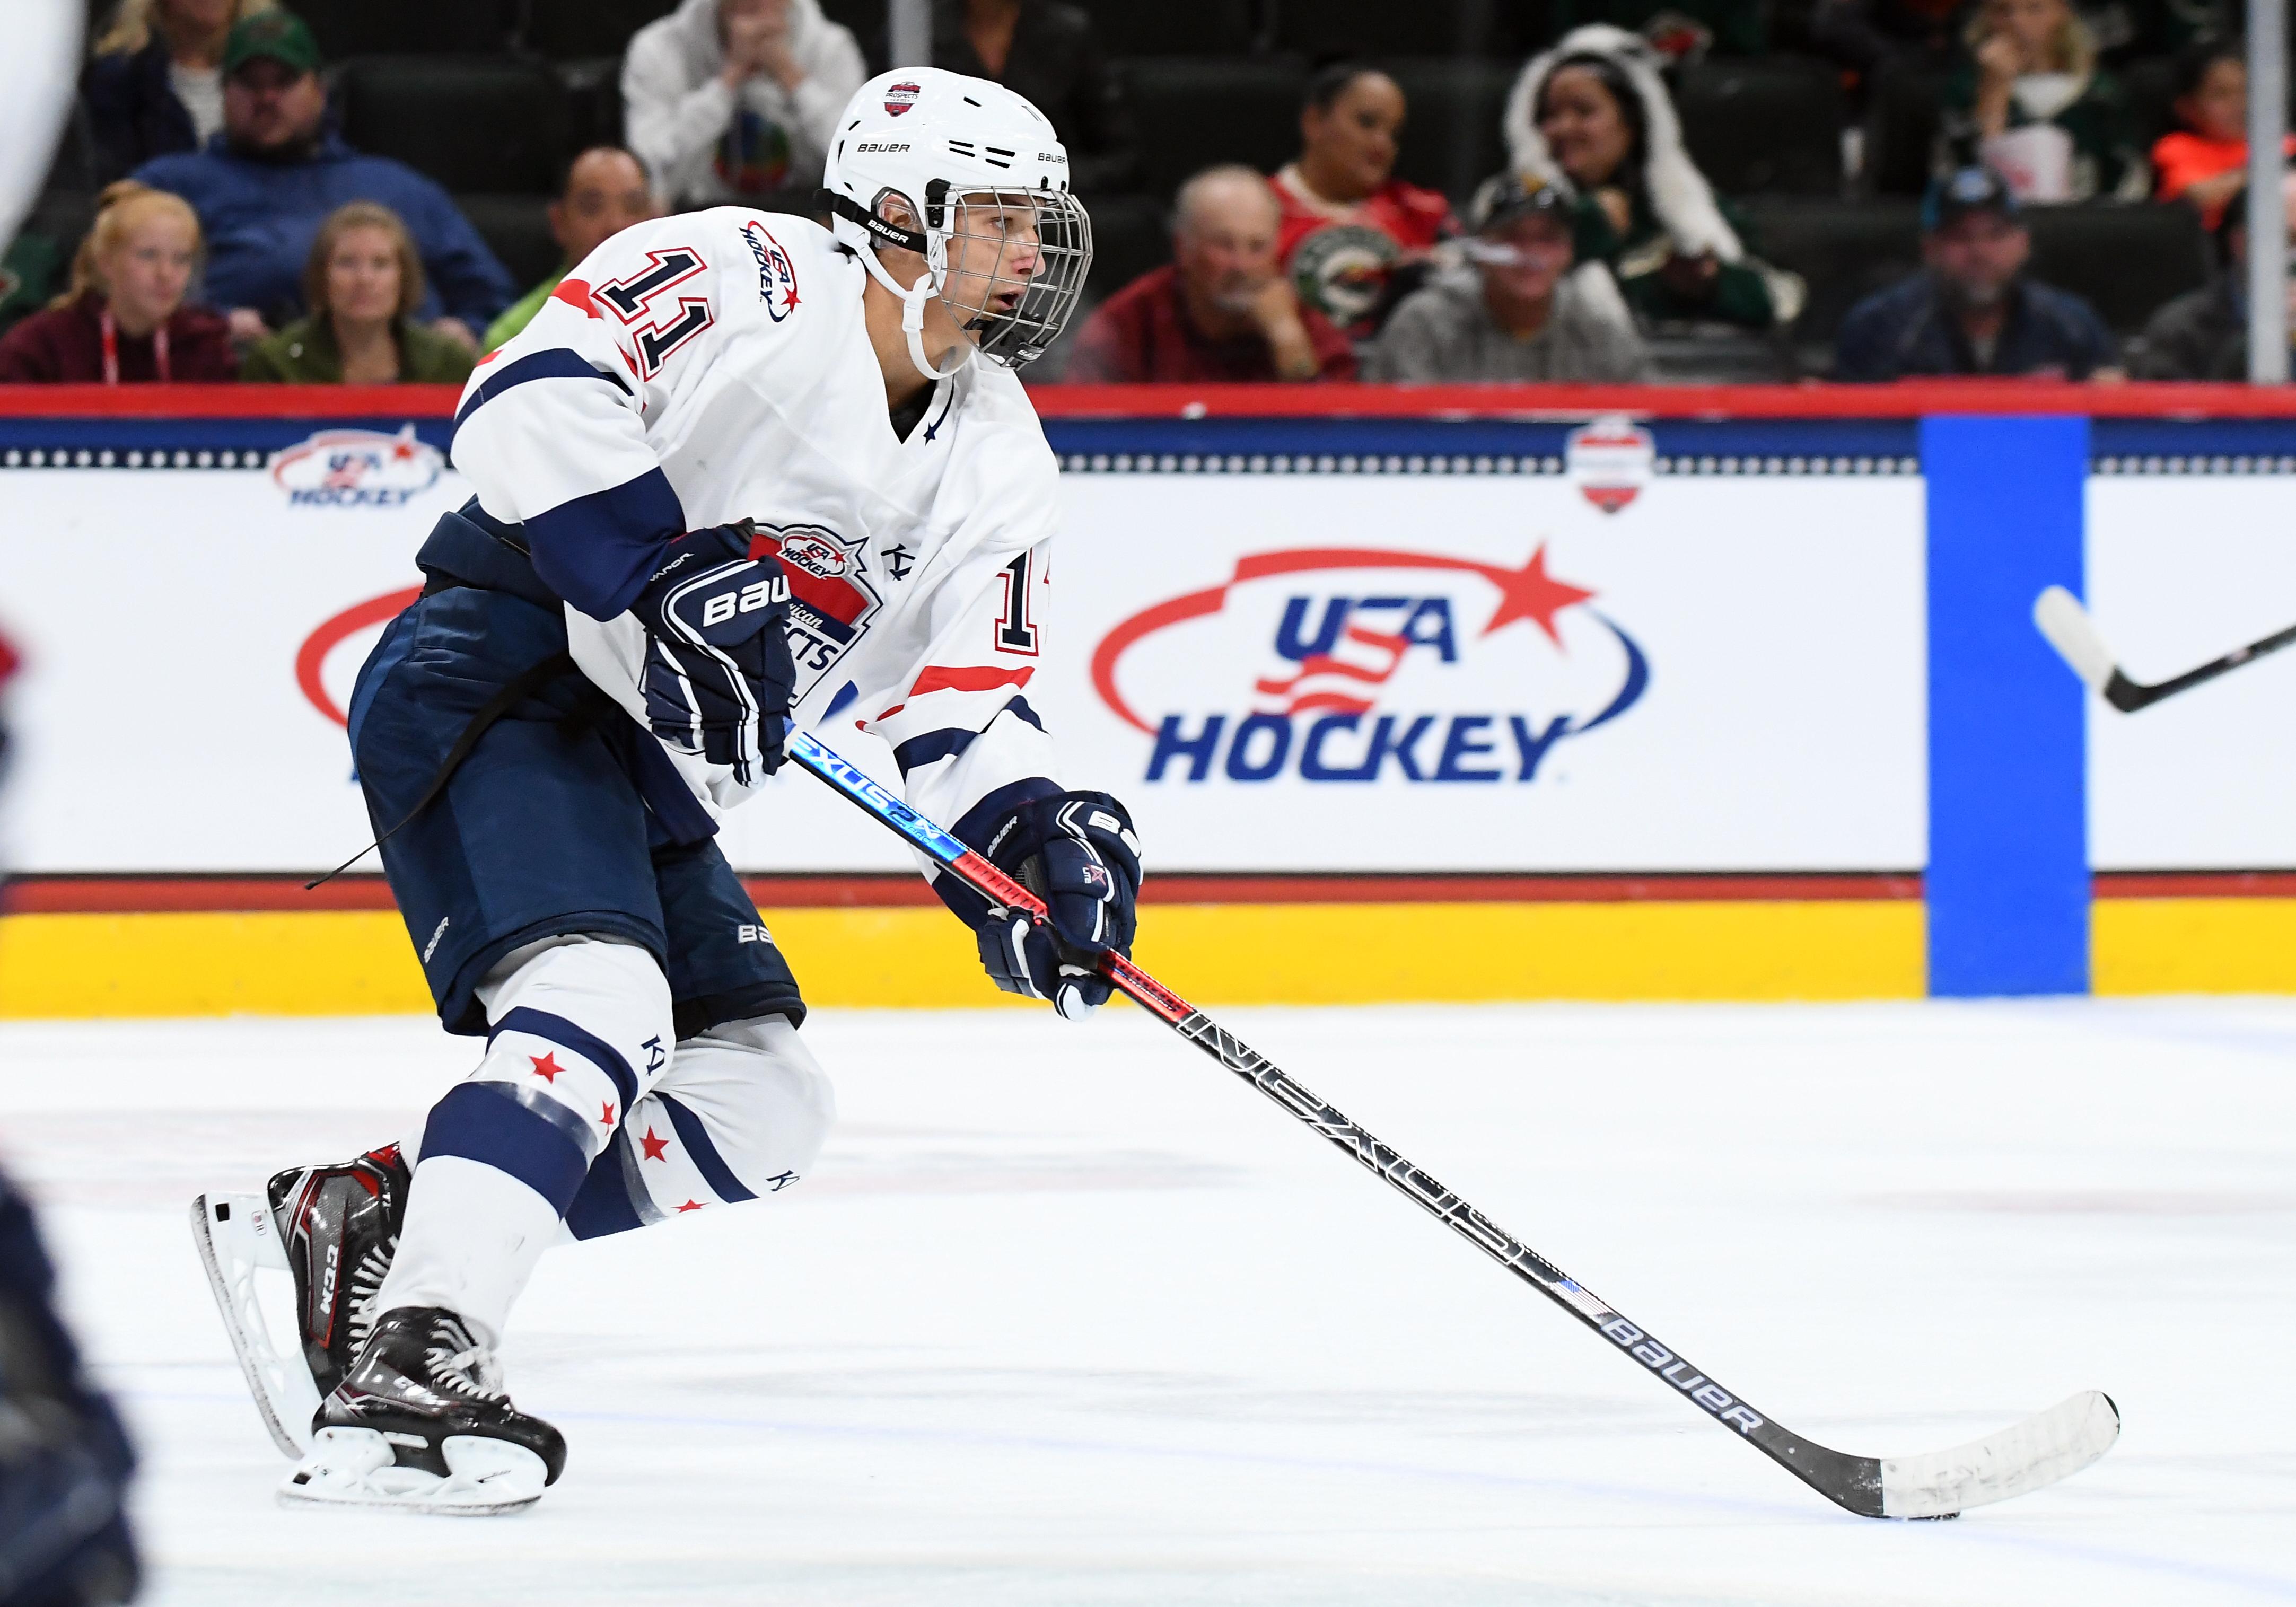 HOCKEY: SEP 19 USA Hockey All-American Prospects Game